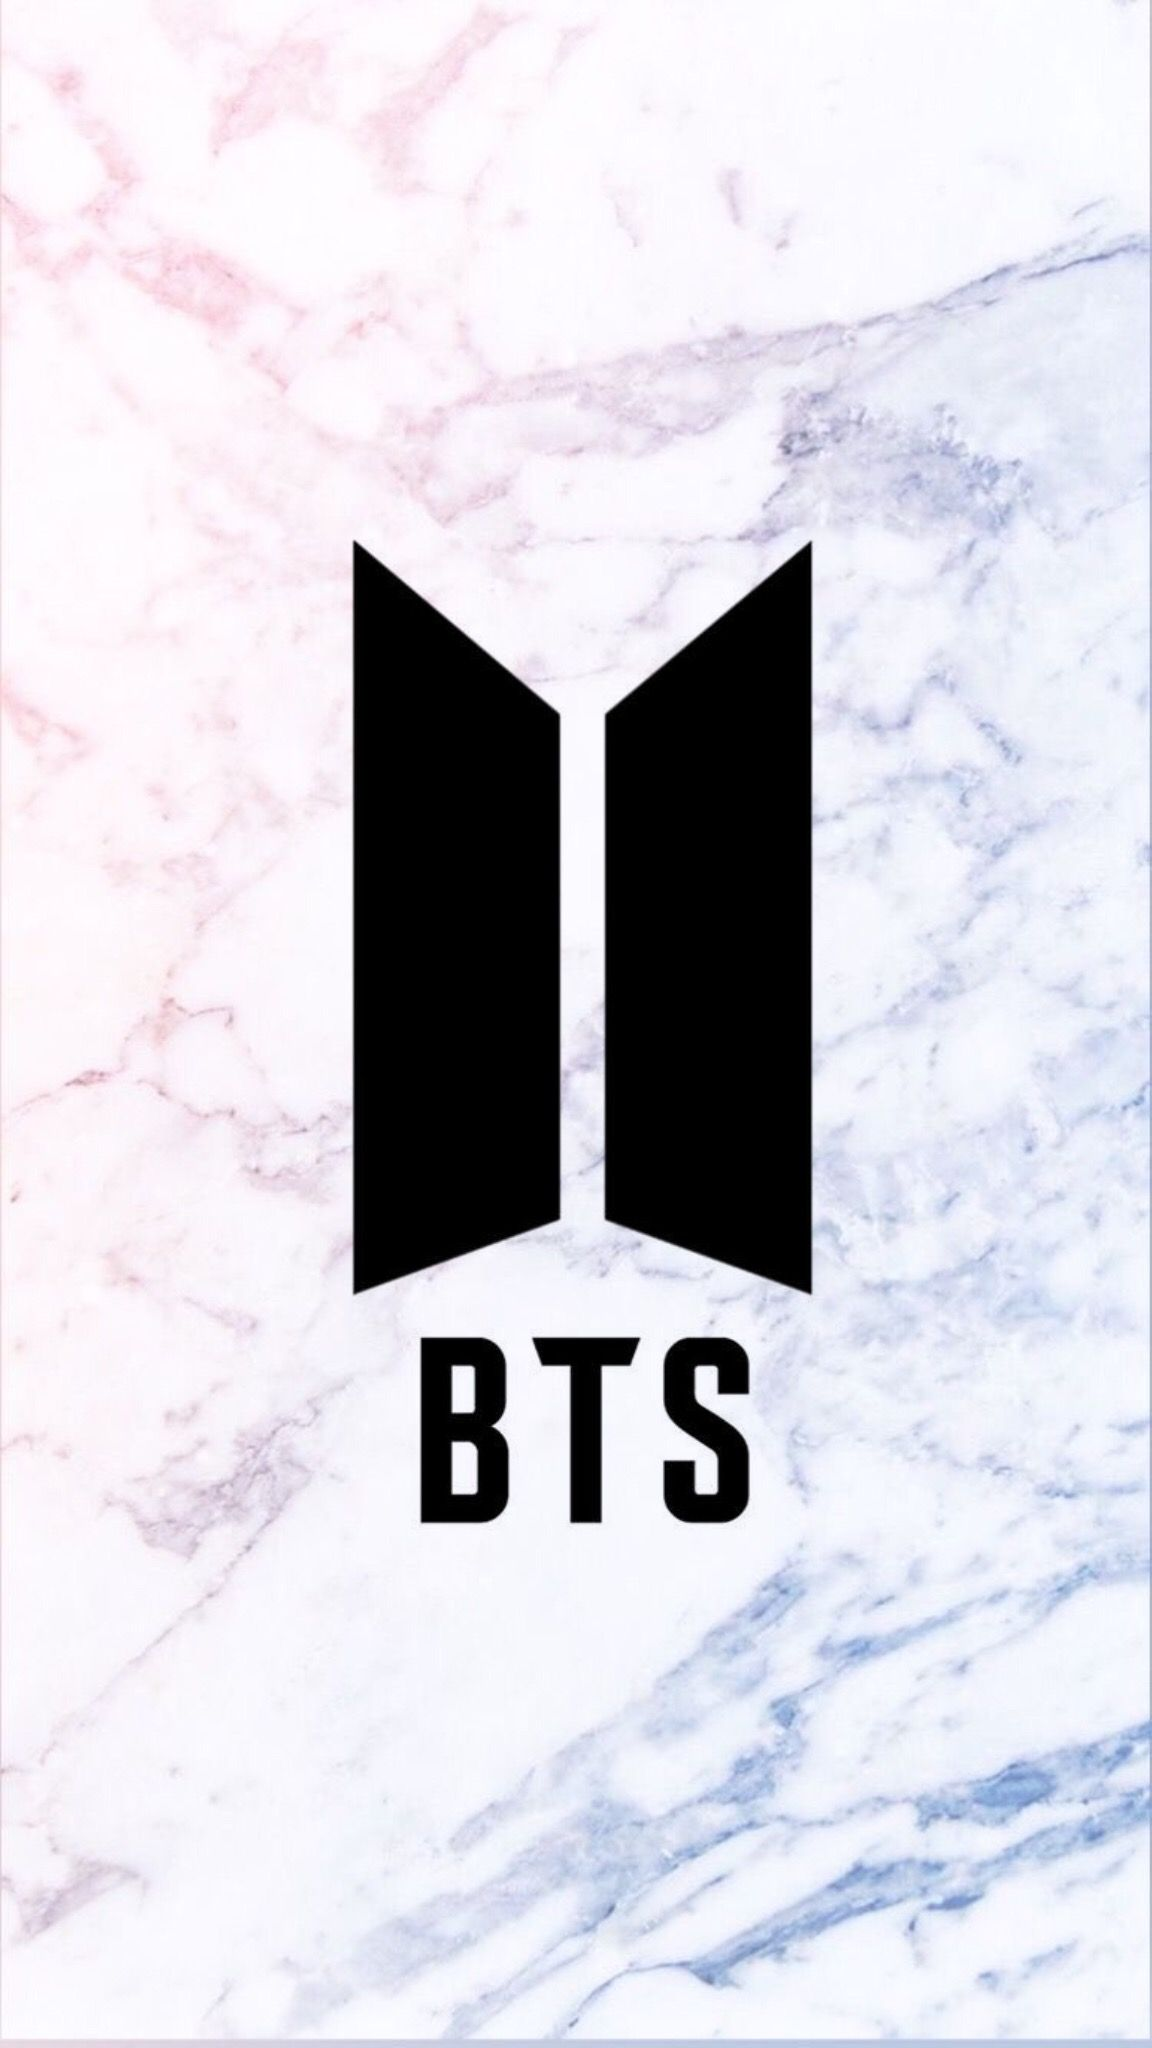 BTS Logo Wallpaper Galaxy marble PinterestBuzziiee_B